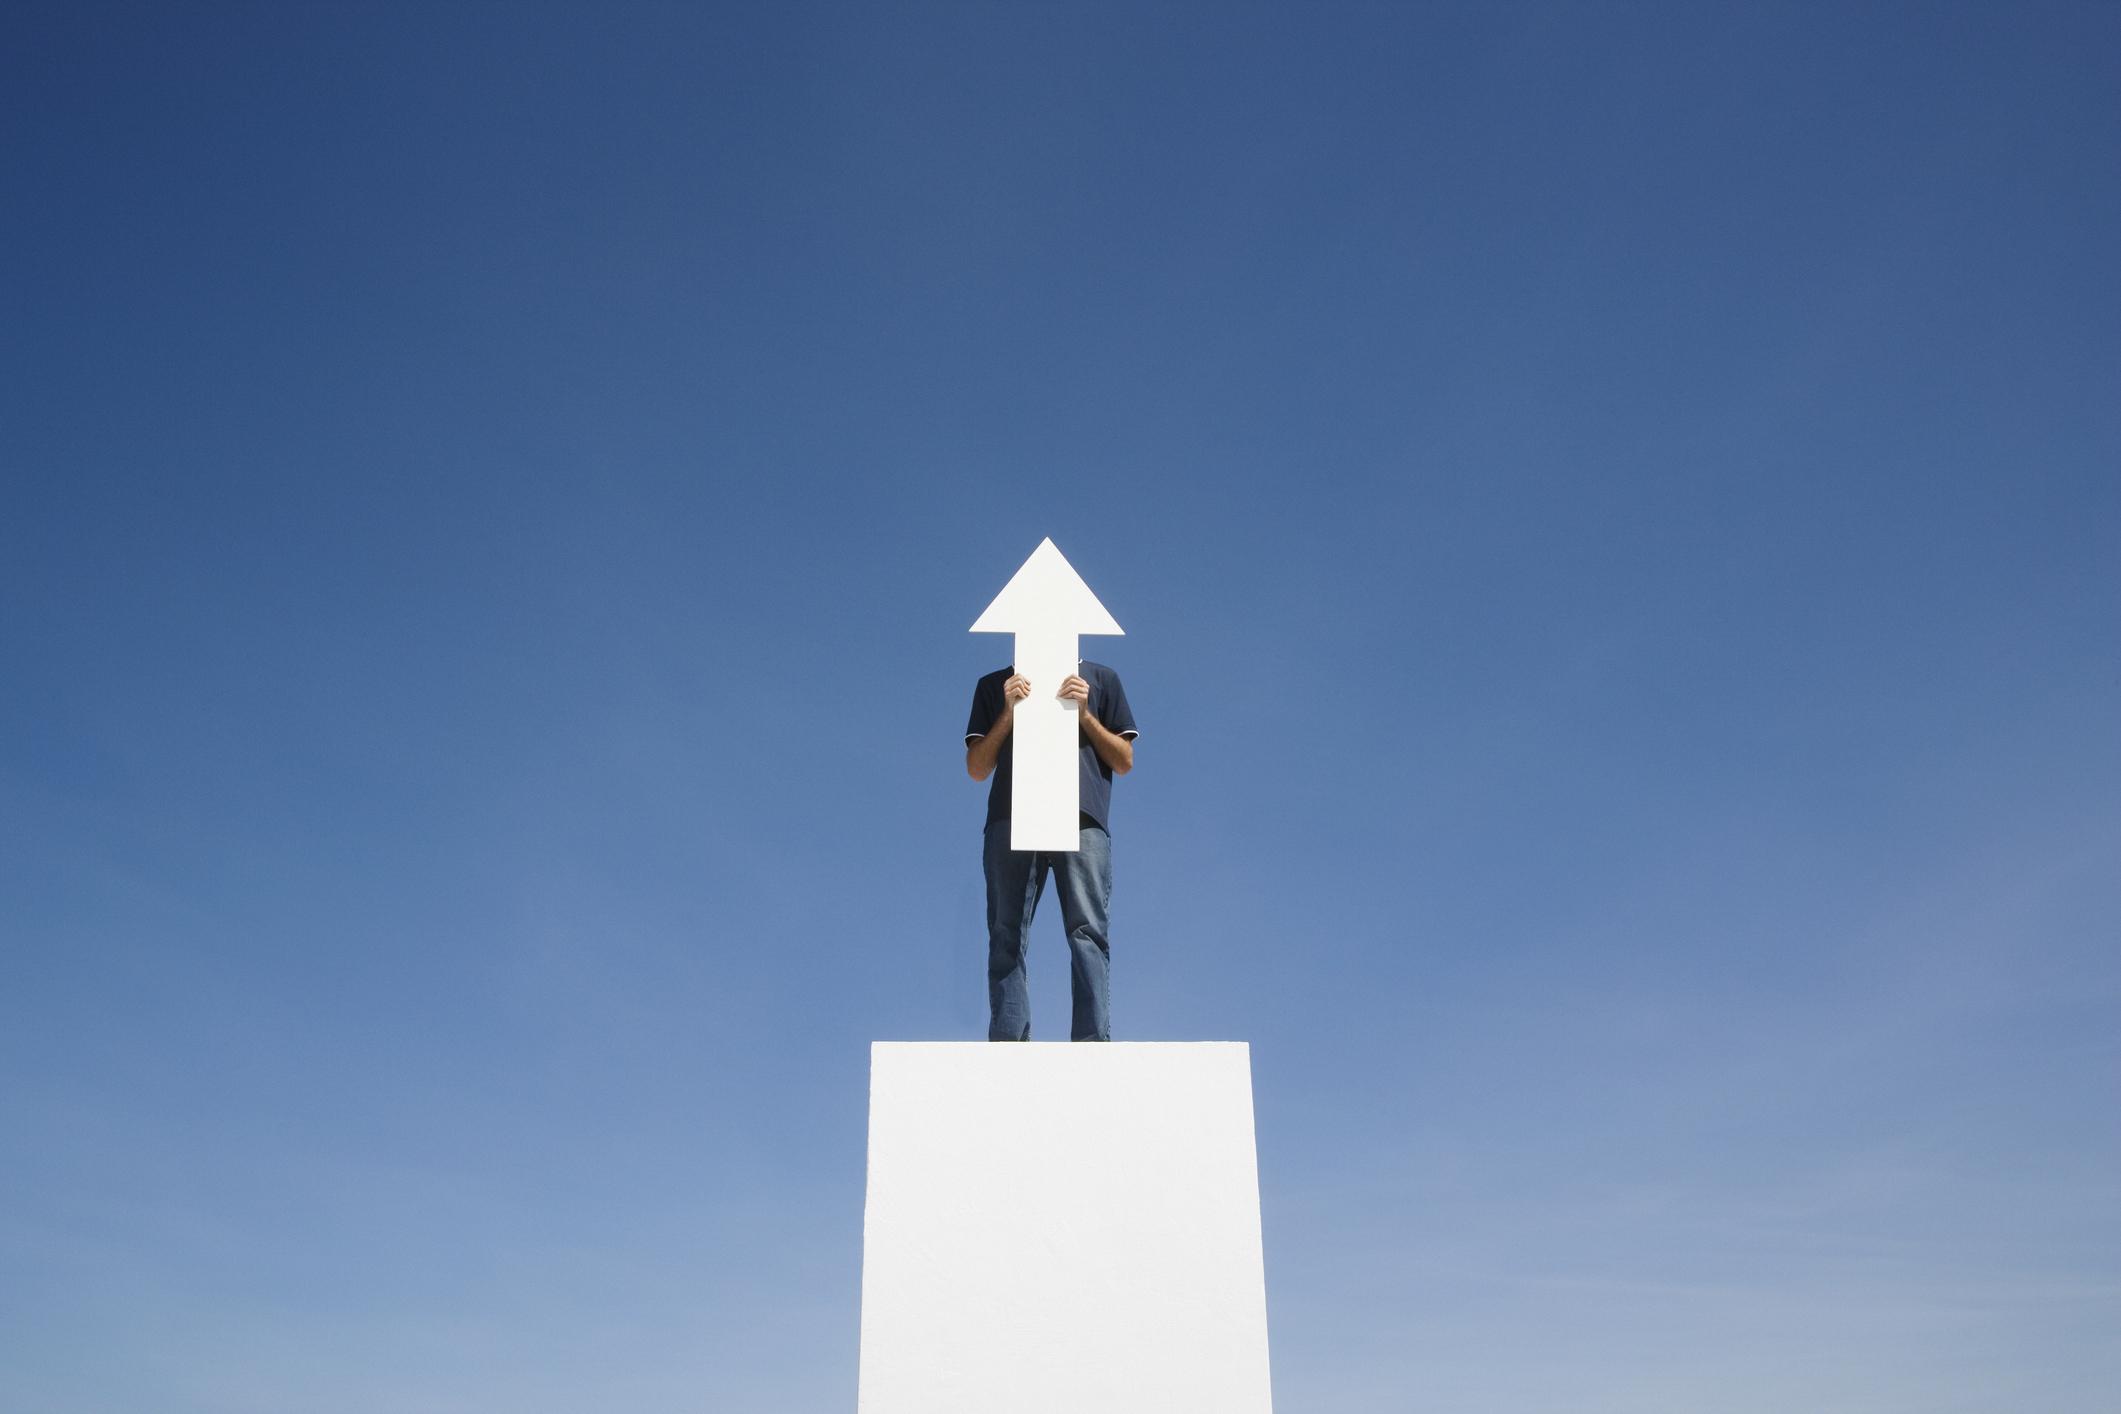 A man holding a cutout arrow pointing upward